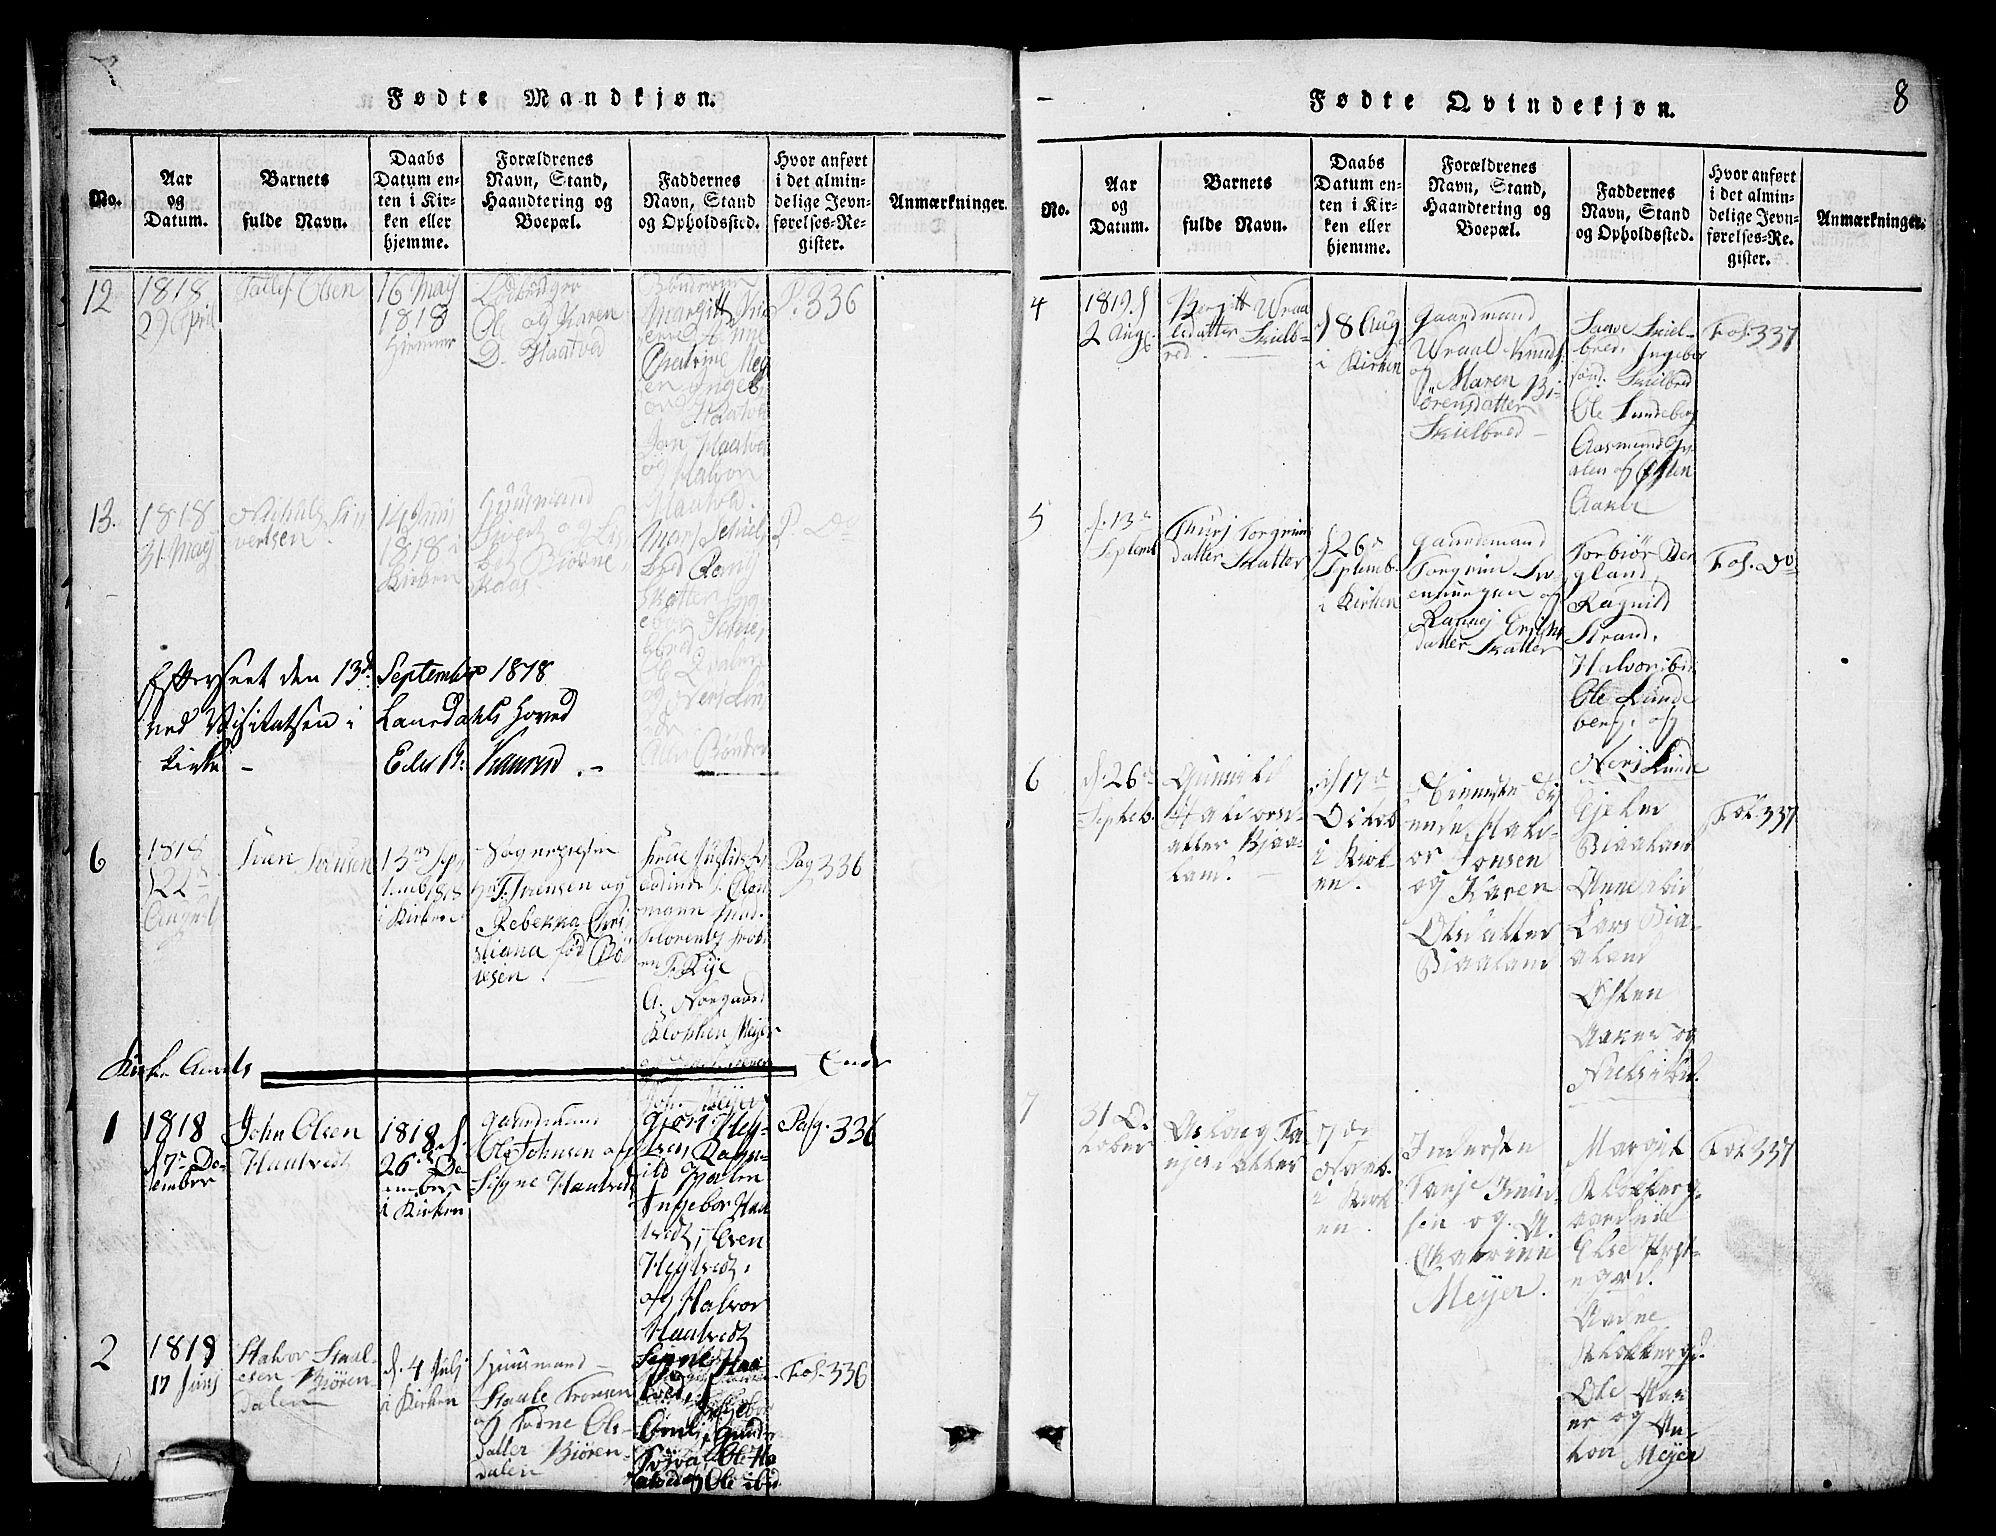 SAKO, Lårdal kirkebøker, G/Ga/L0001: Klokkerbok nr. I 1, 1815-1861, s. 8